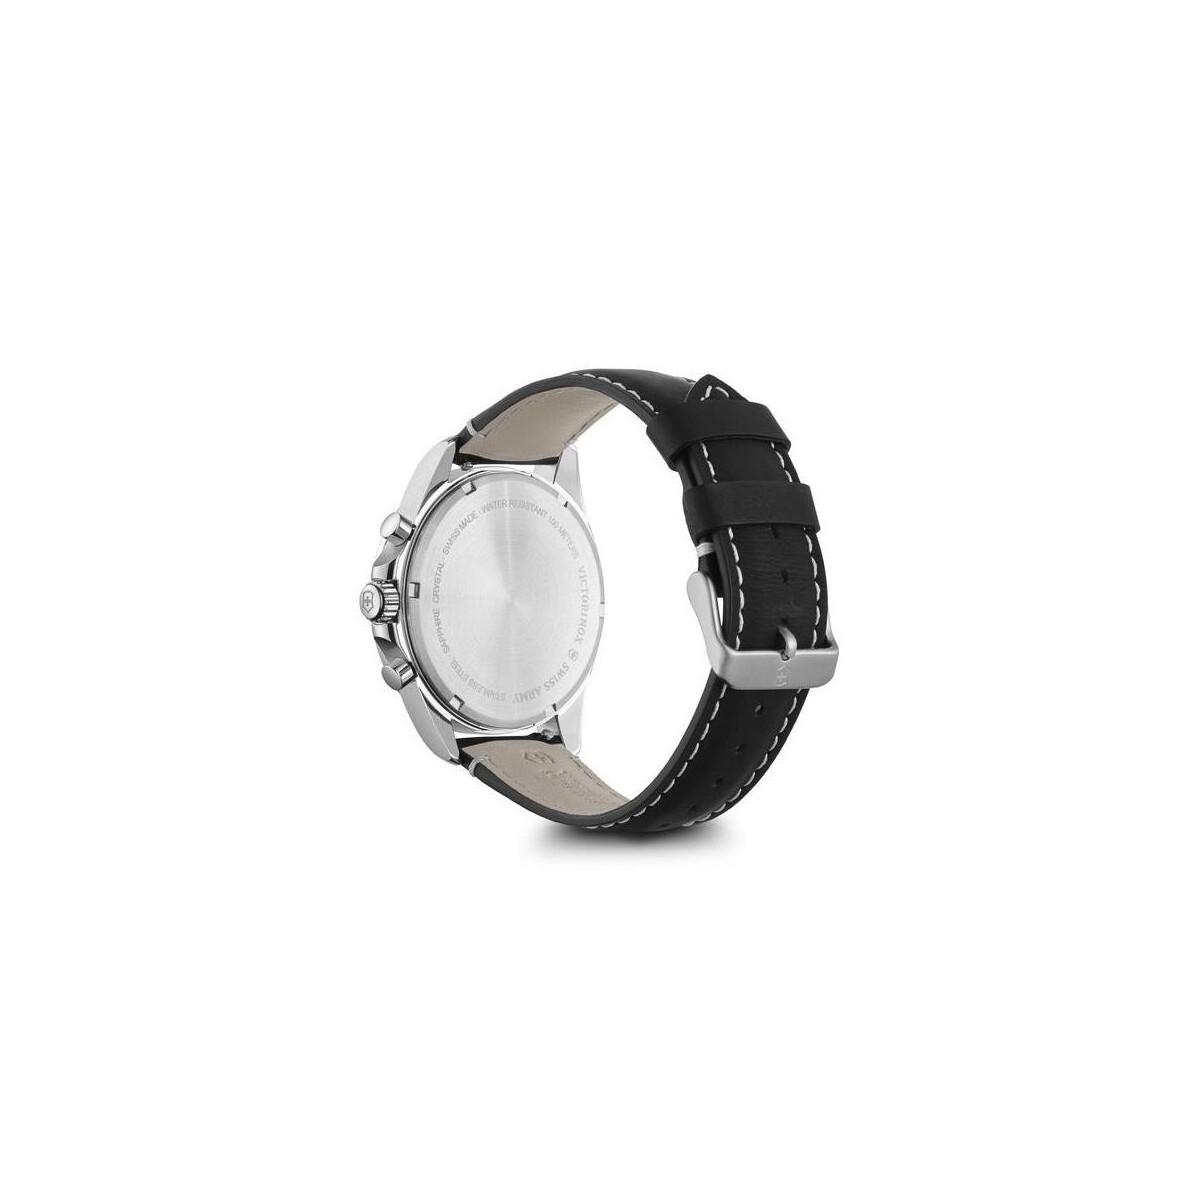 Reloj Victorinox Fieldforce Leather 241852